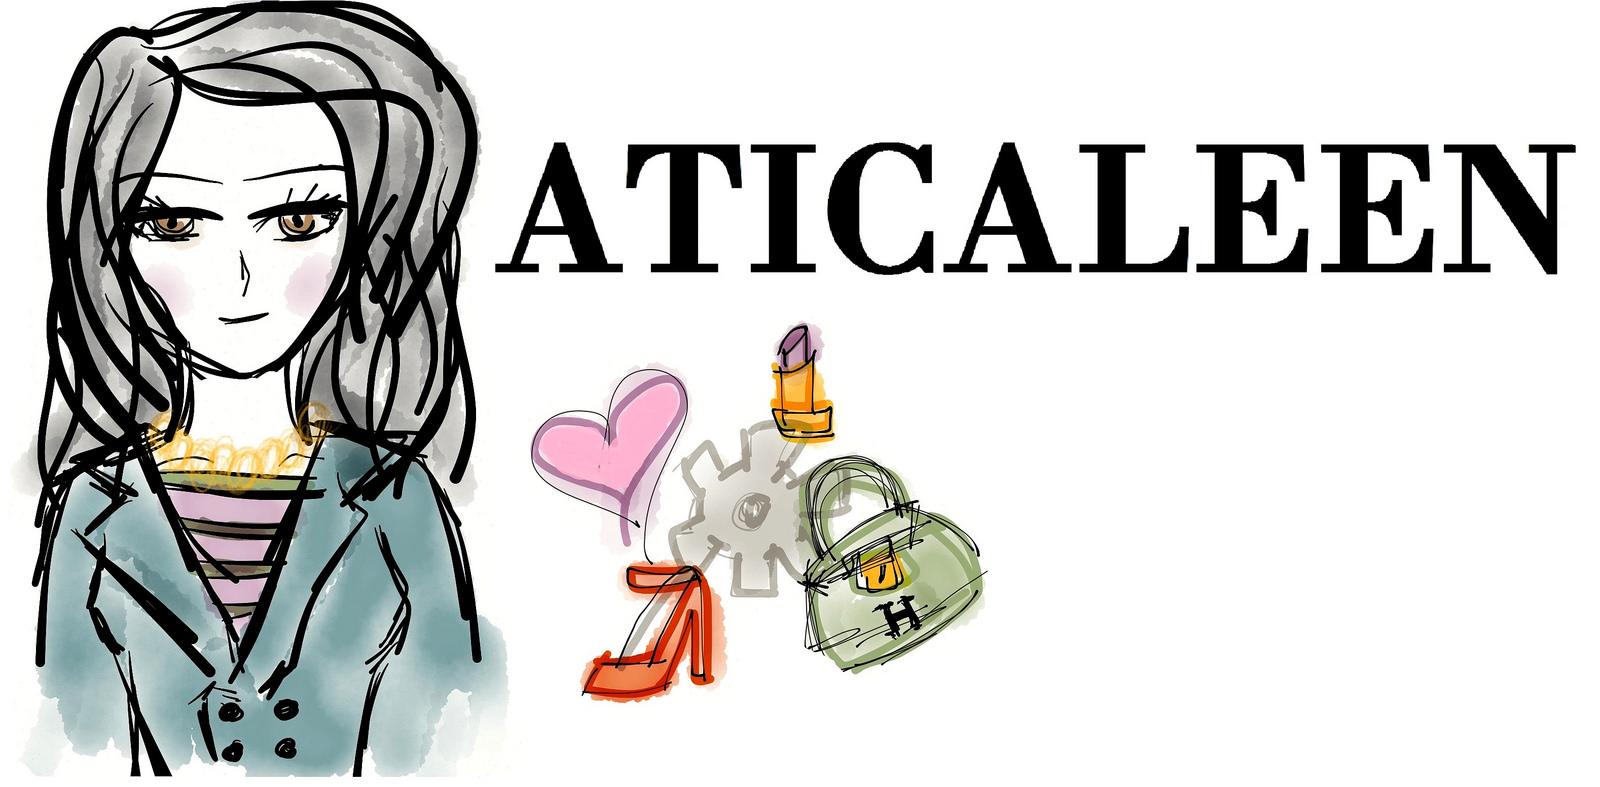 ATICALEEN